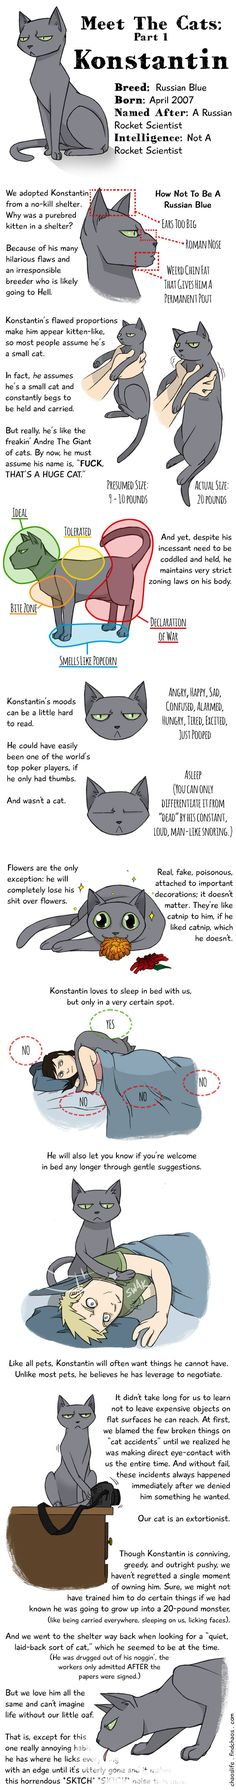 Meet The Cats: Konstantin